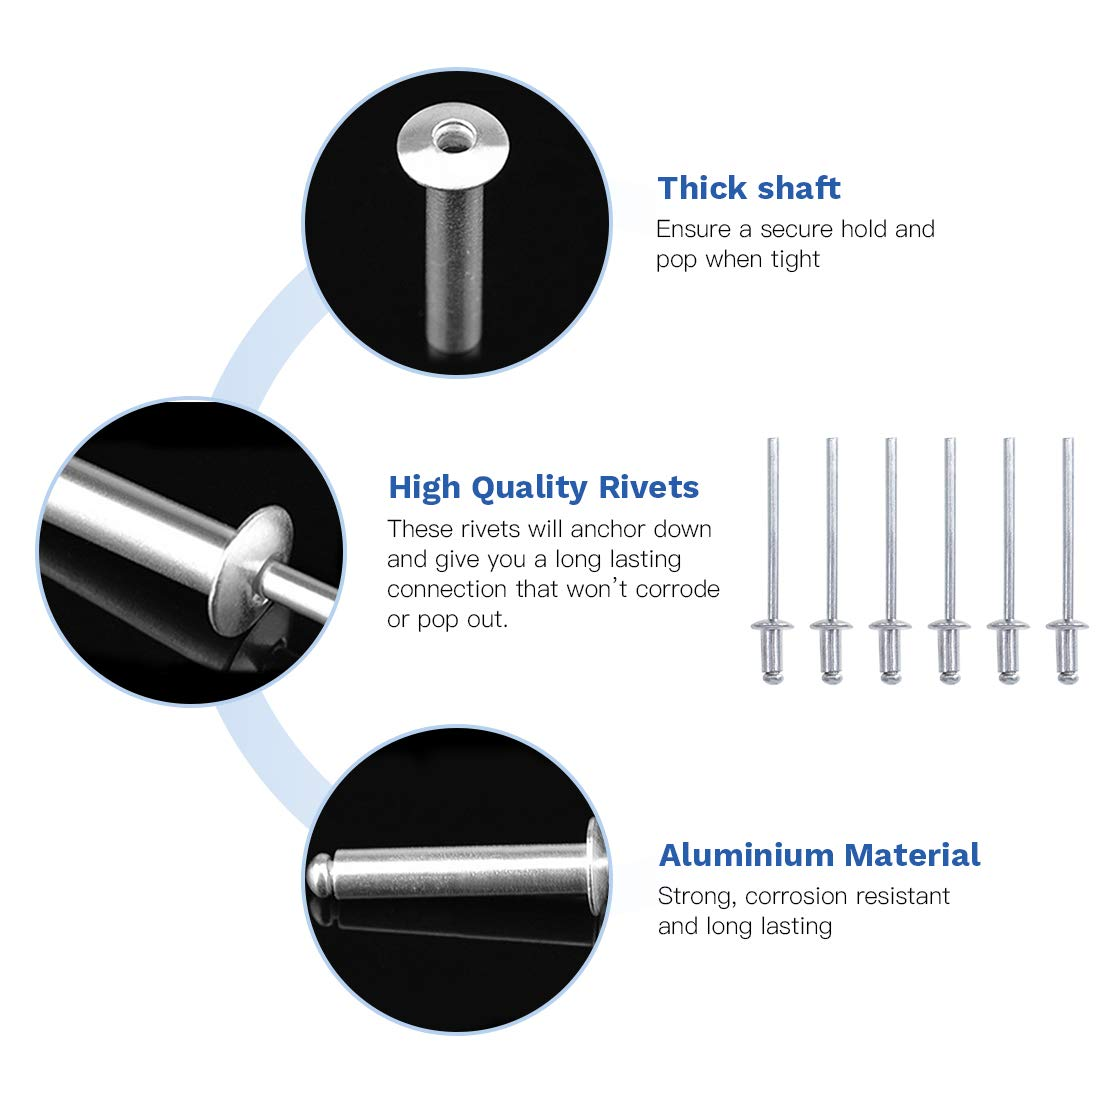 and Duct Work Automotive Glarks 200Pcs 1//8 x 15//16 Aluminum Body Steel Mandrel Dome Head Blind Rivets Set for Sheet Metal Railway